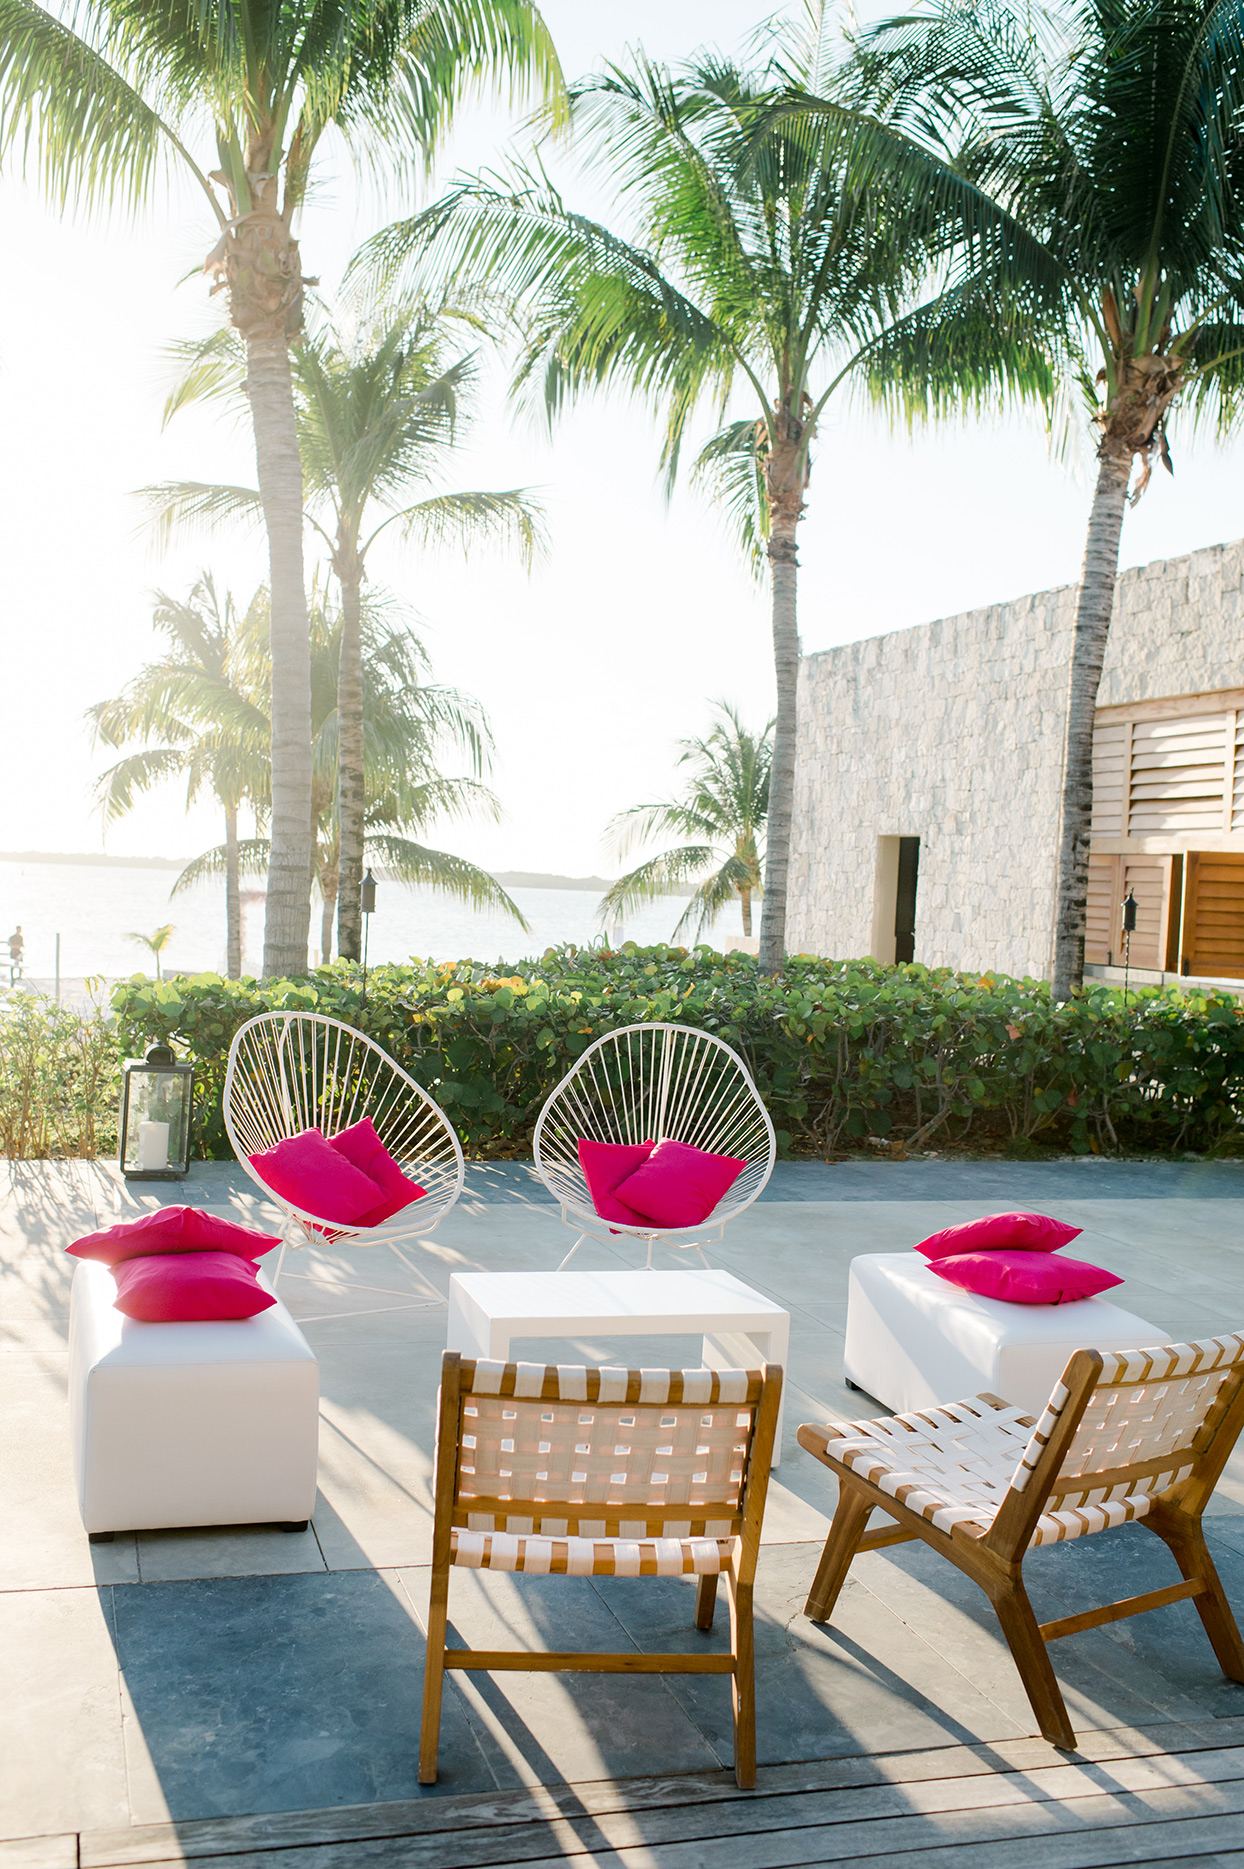 katie nick wedding lounge white chairs hot pink pillows